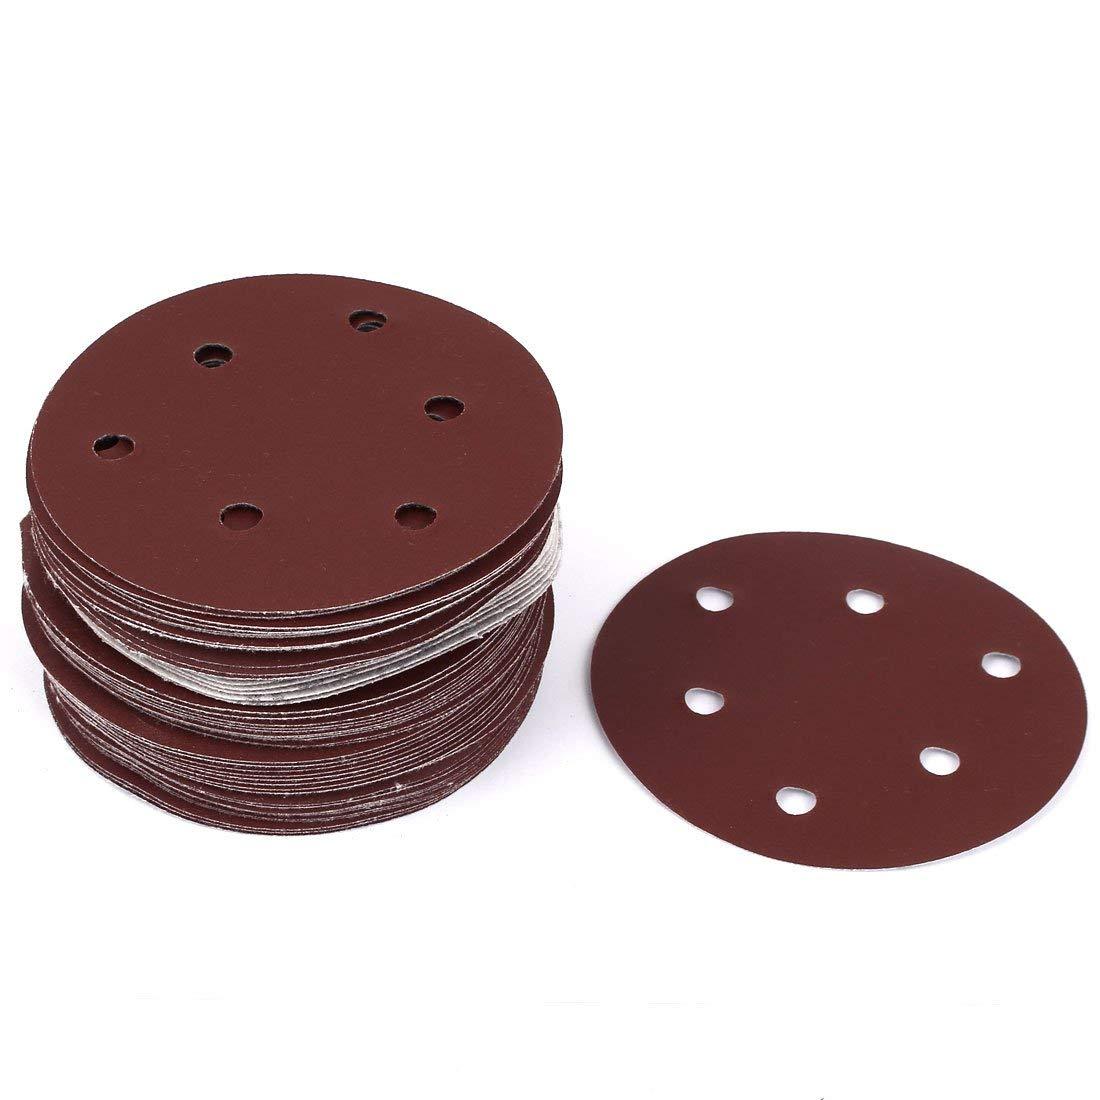 "Grinding Polishing Sanding Disc Sandpaper 120 Grit Rufous 4/"" Dia 10pcs"